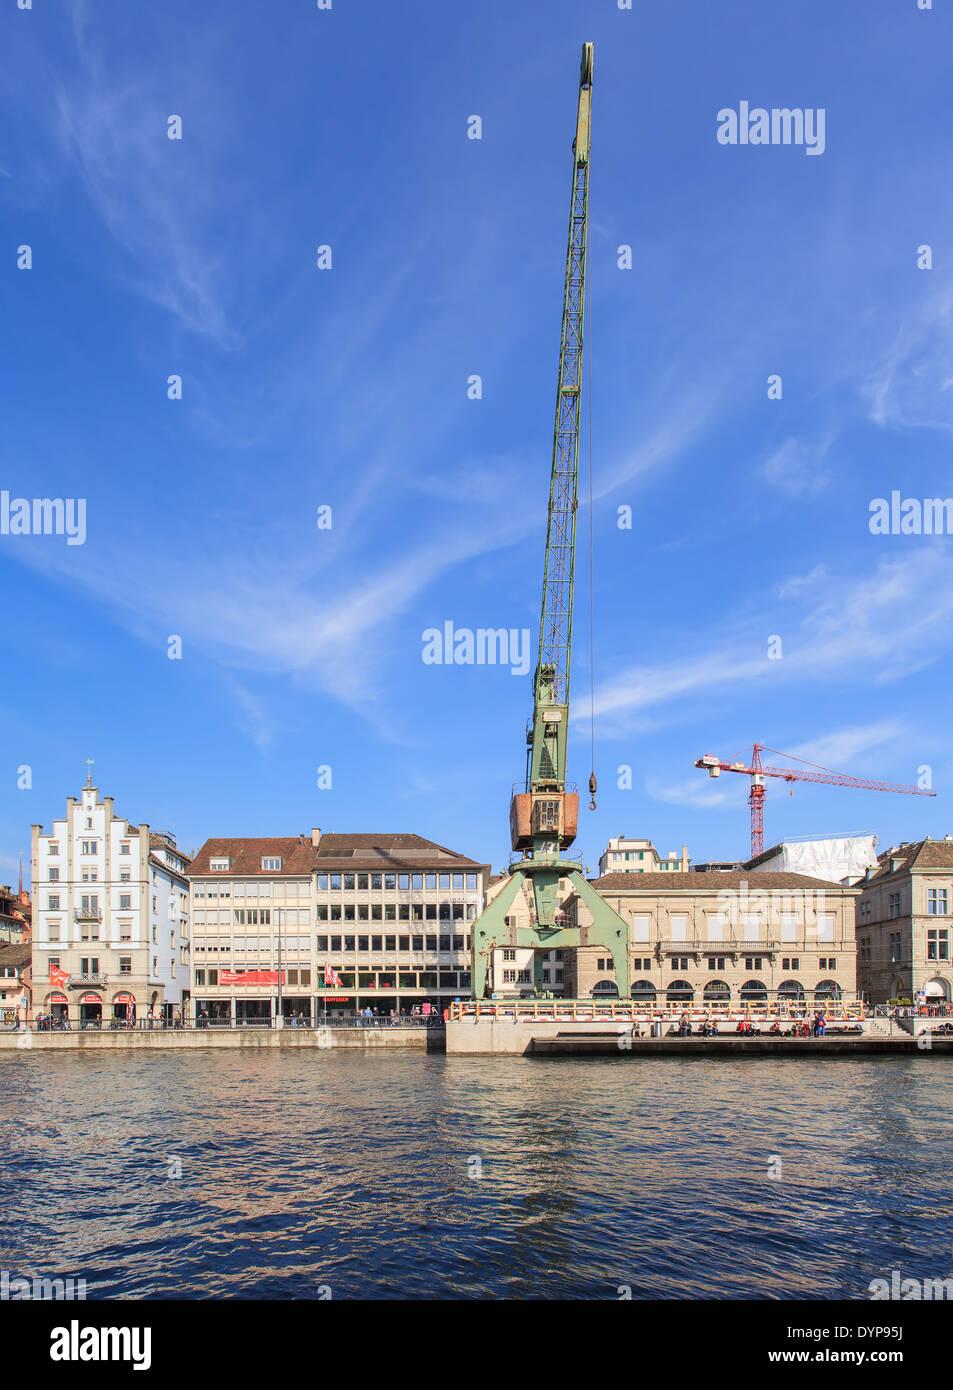 Zurich cityscape with a dockside crane (German: Hafenkran) - Stock Image